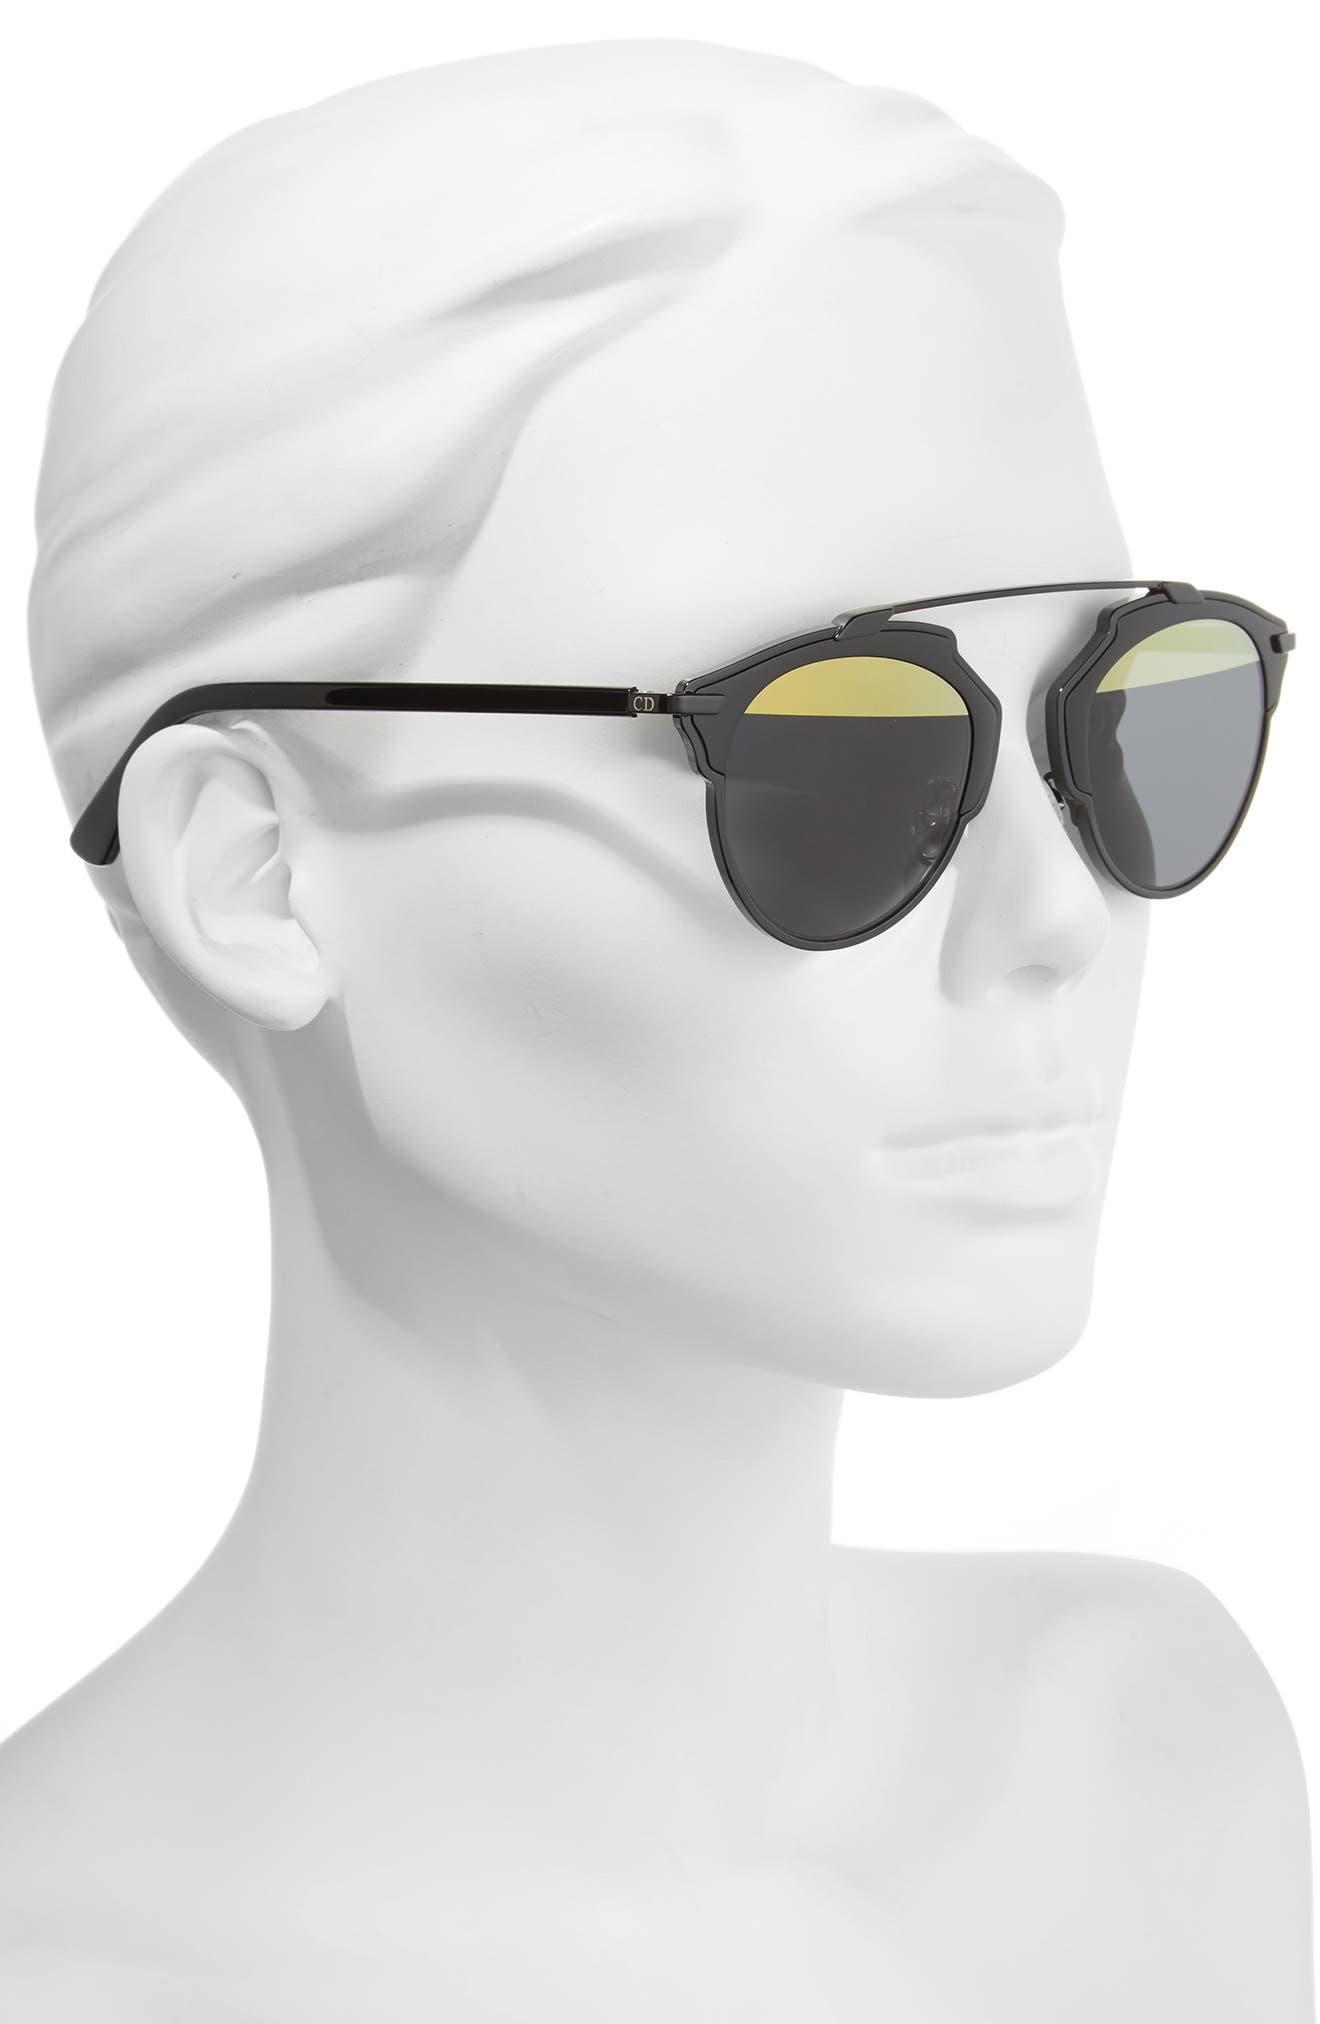 So Real 48mm Brow Bar Sunglasses,                             Alternate thumbnail 32, color,